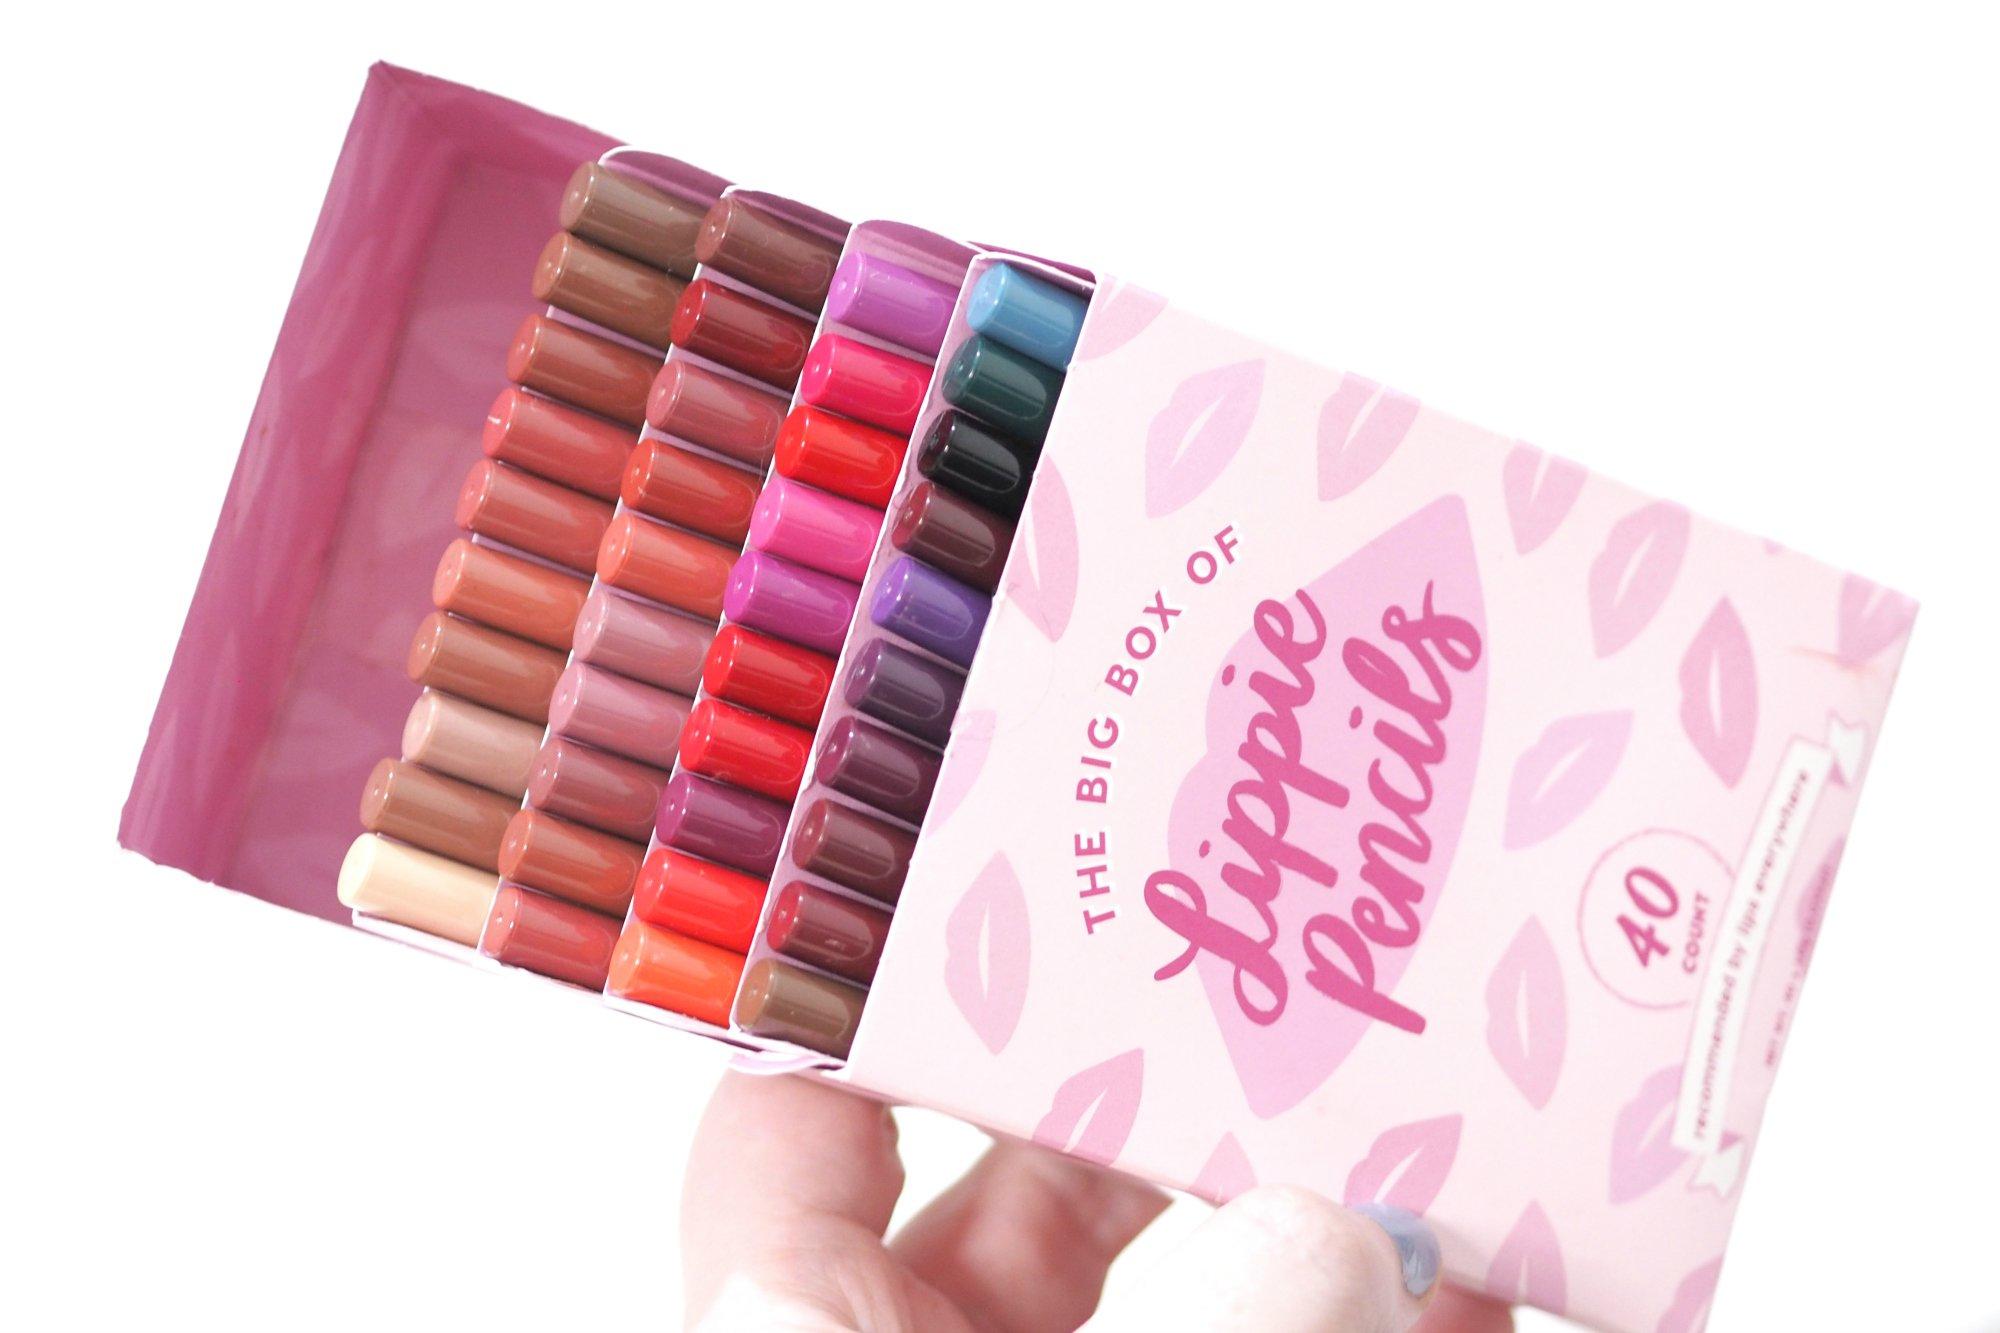 The Big Box Of Lippie Pencils by Colourpop #22